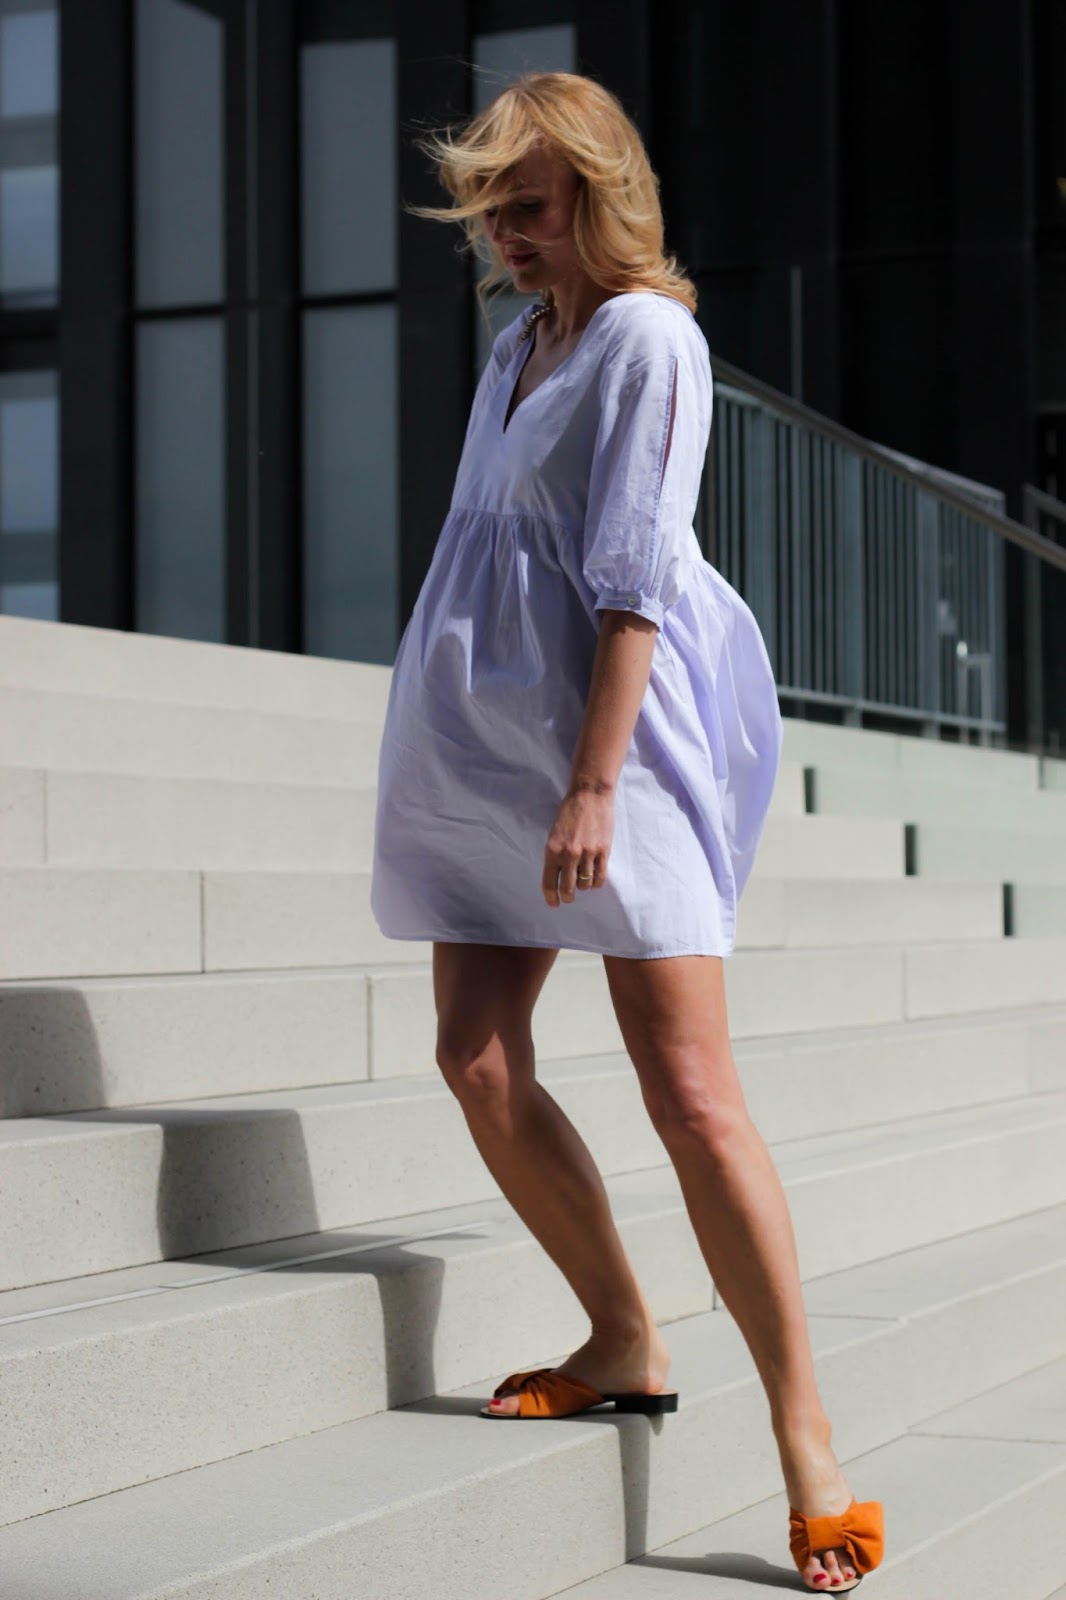 ueber 40 Fashion Blog